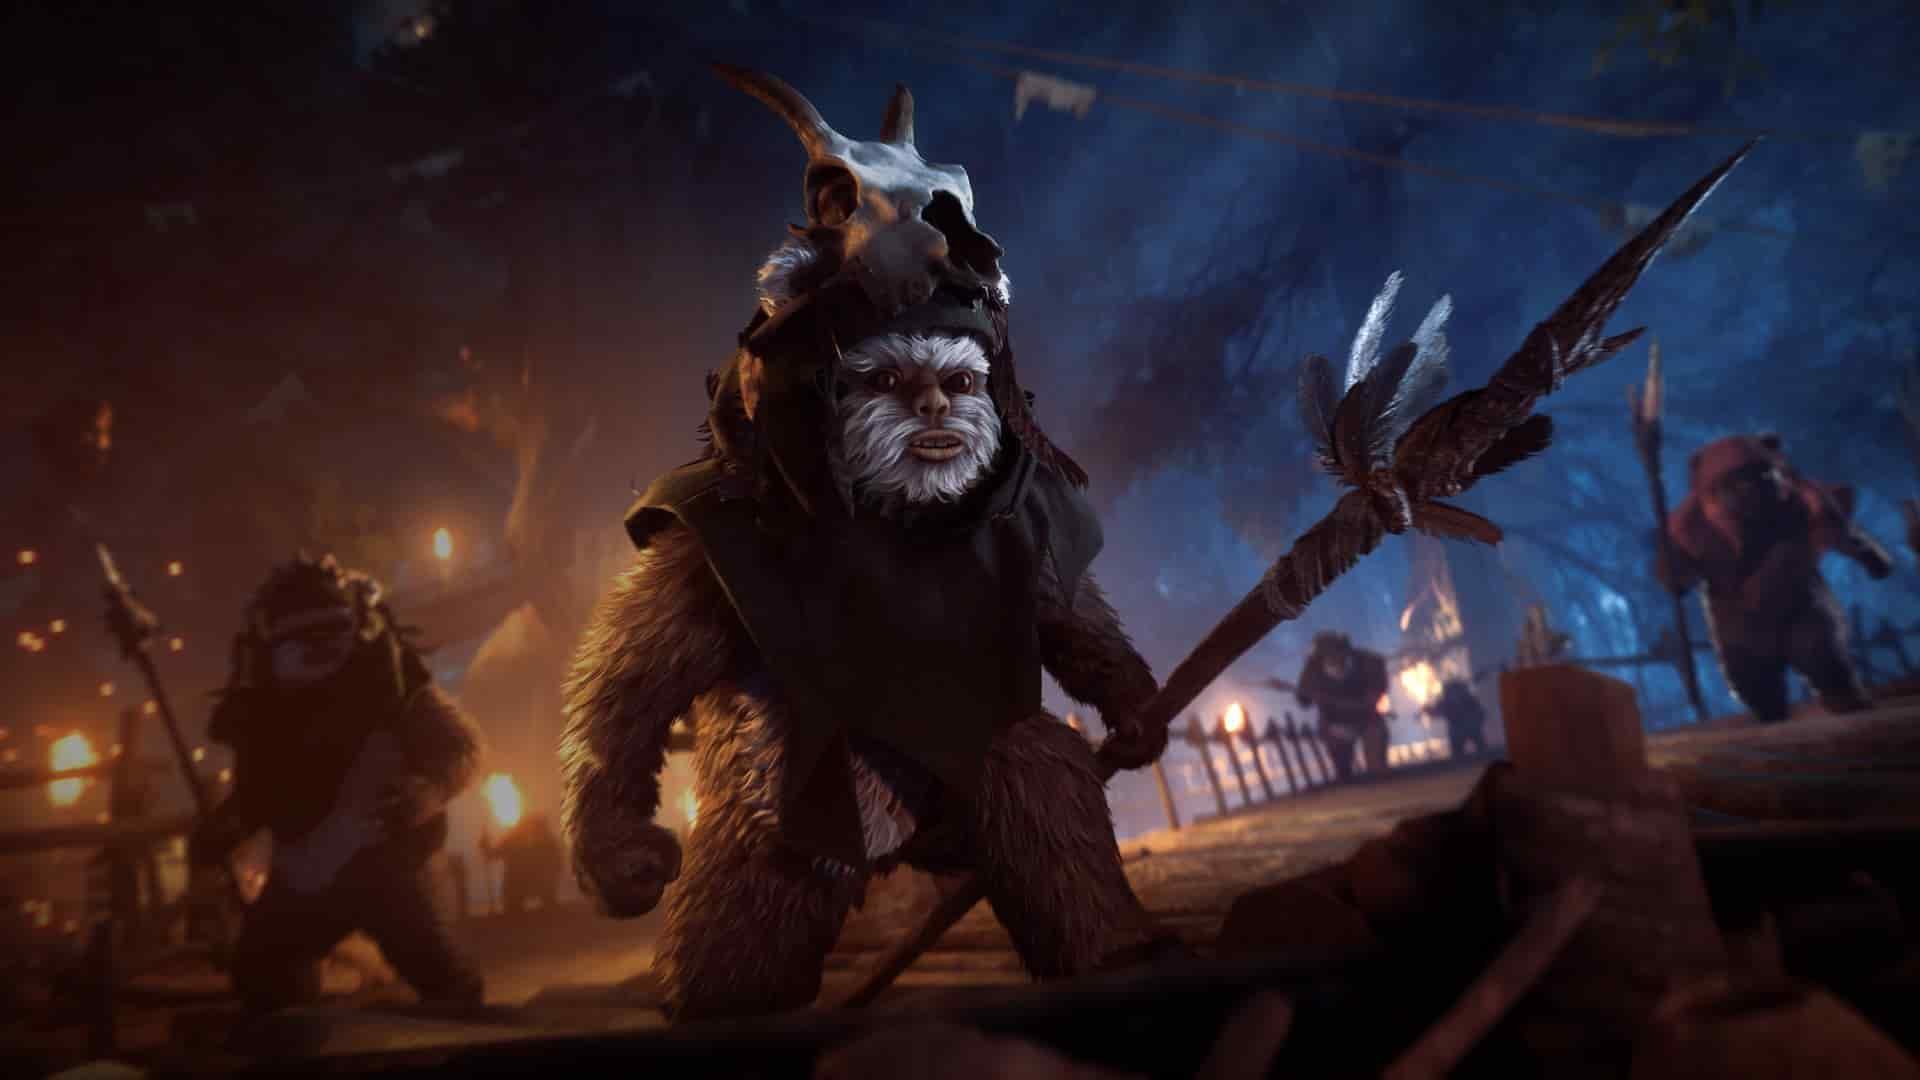 Star Wars Battlefront 2 1 41 Update Patch Notes Revealed Playstation Universe